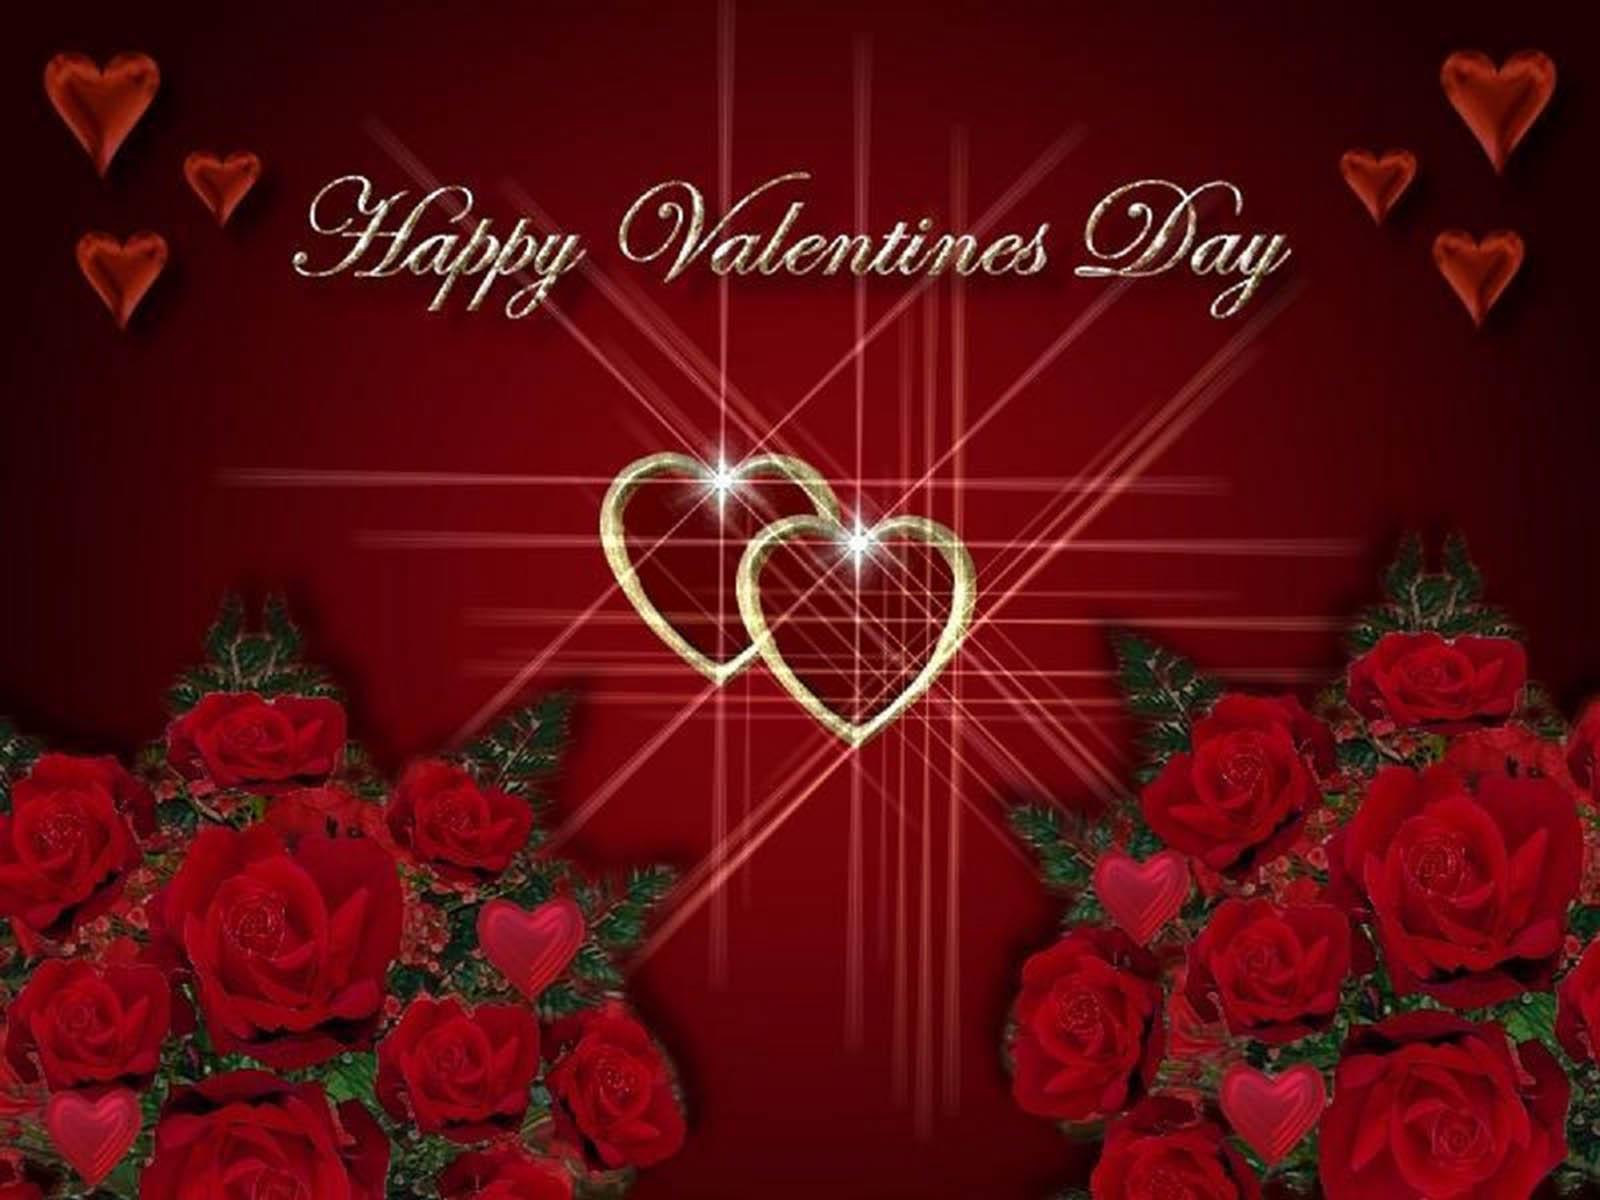 Desktop Wallpapers Valentines Day Desktop Backgrounds Valentines Day 1600x1200